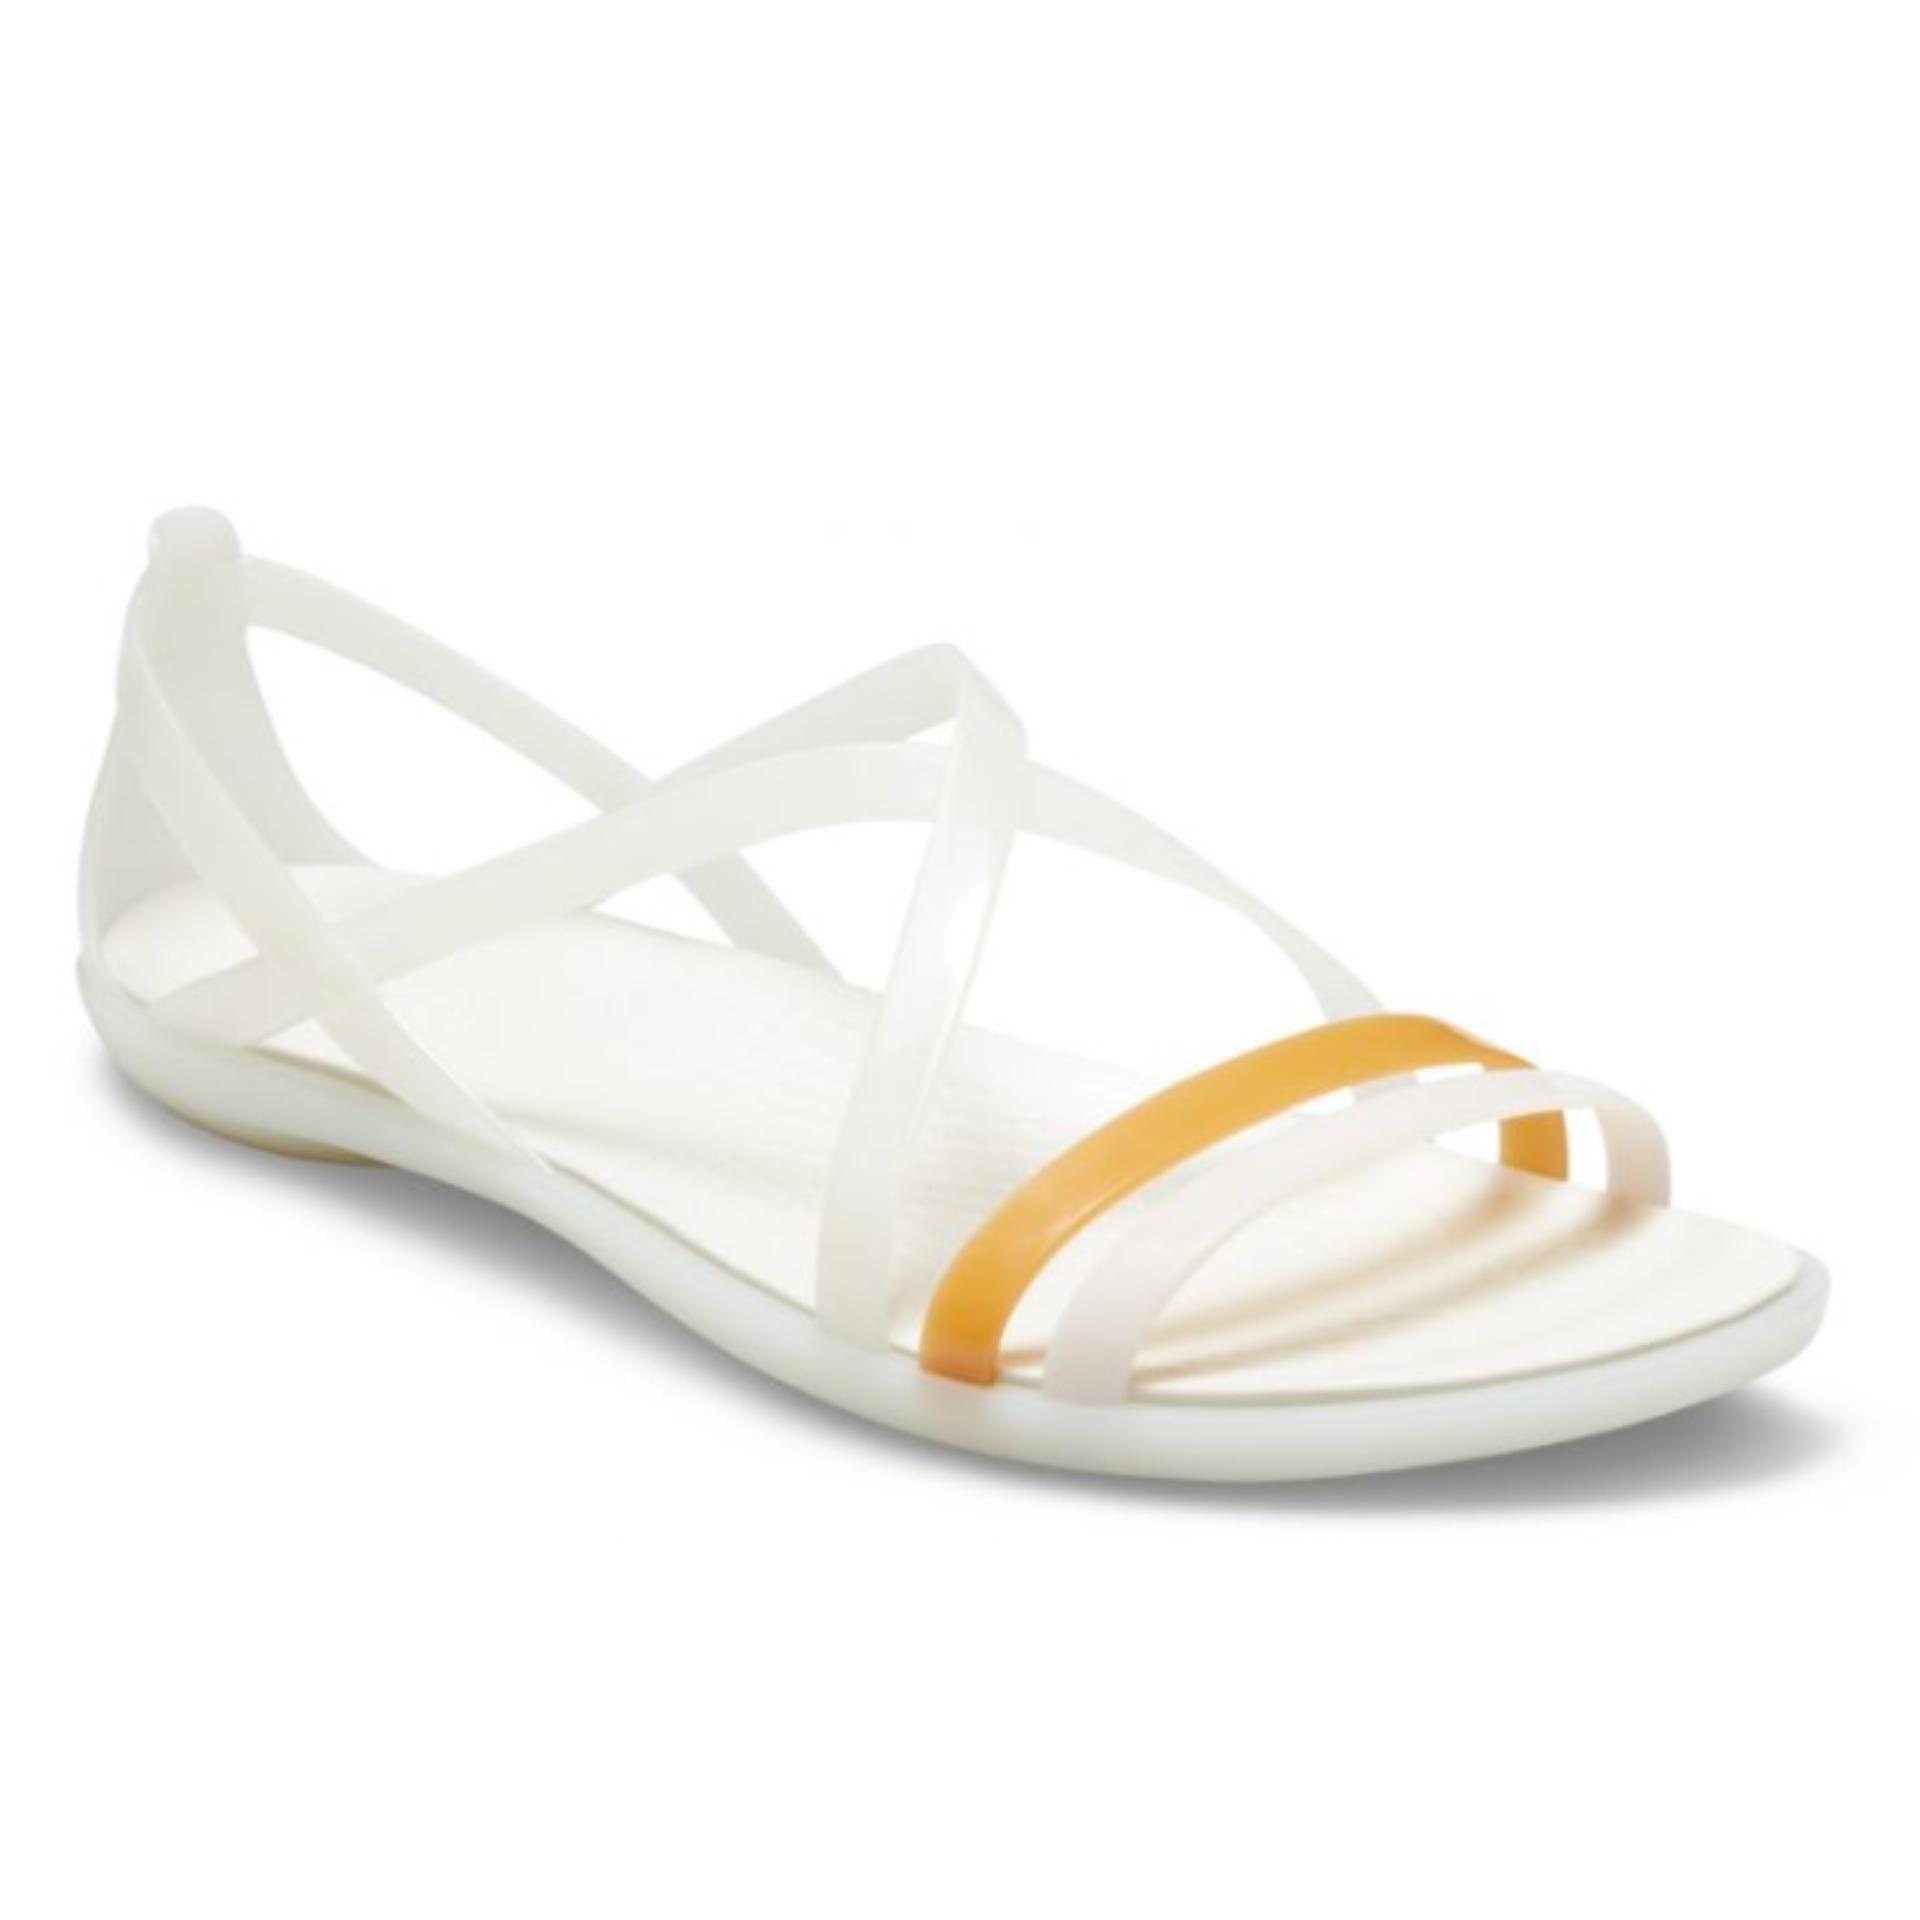 59a9741300db Flip Flops for Women for sale - Womens Flip Flops online brands ...